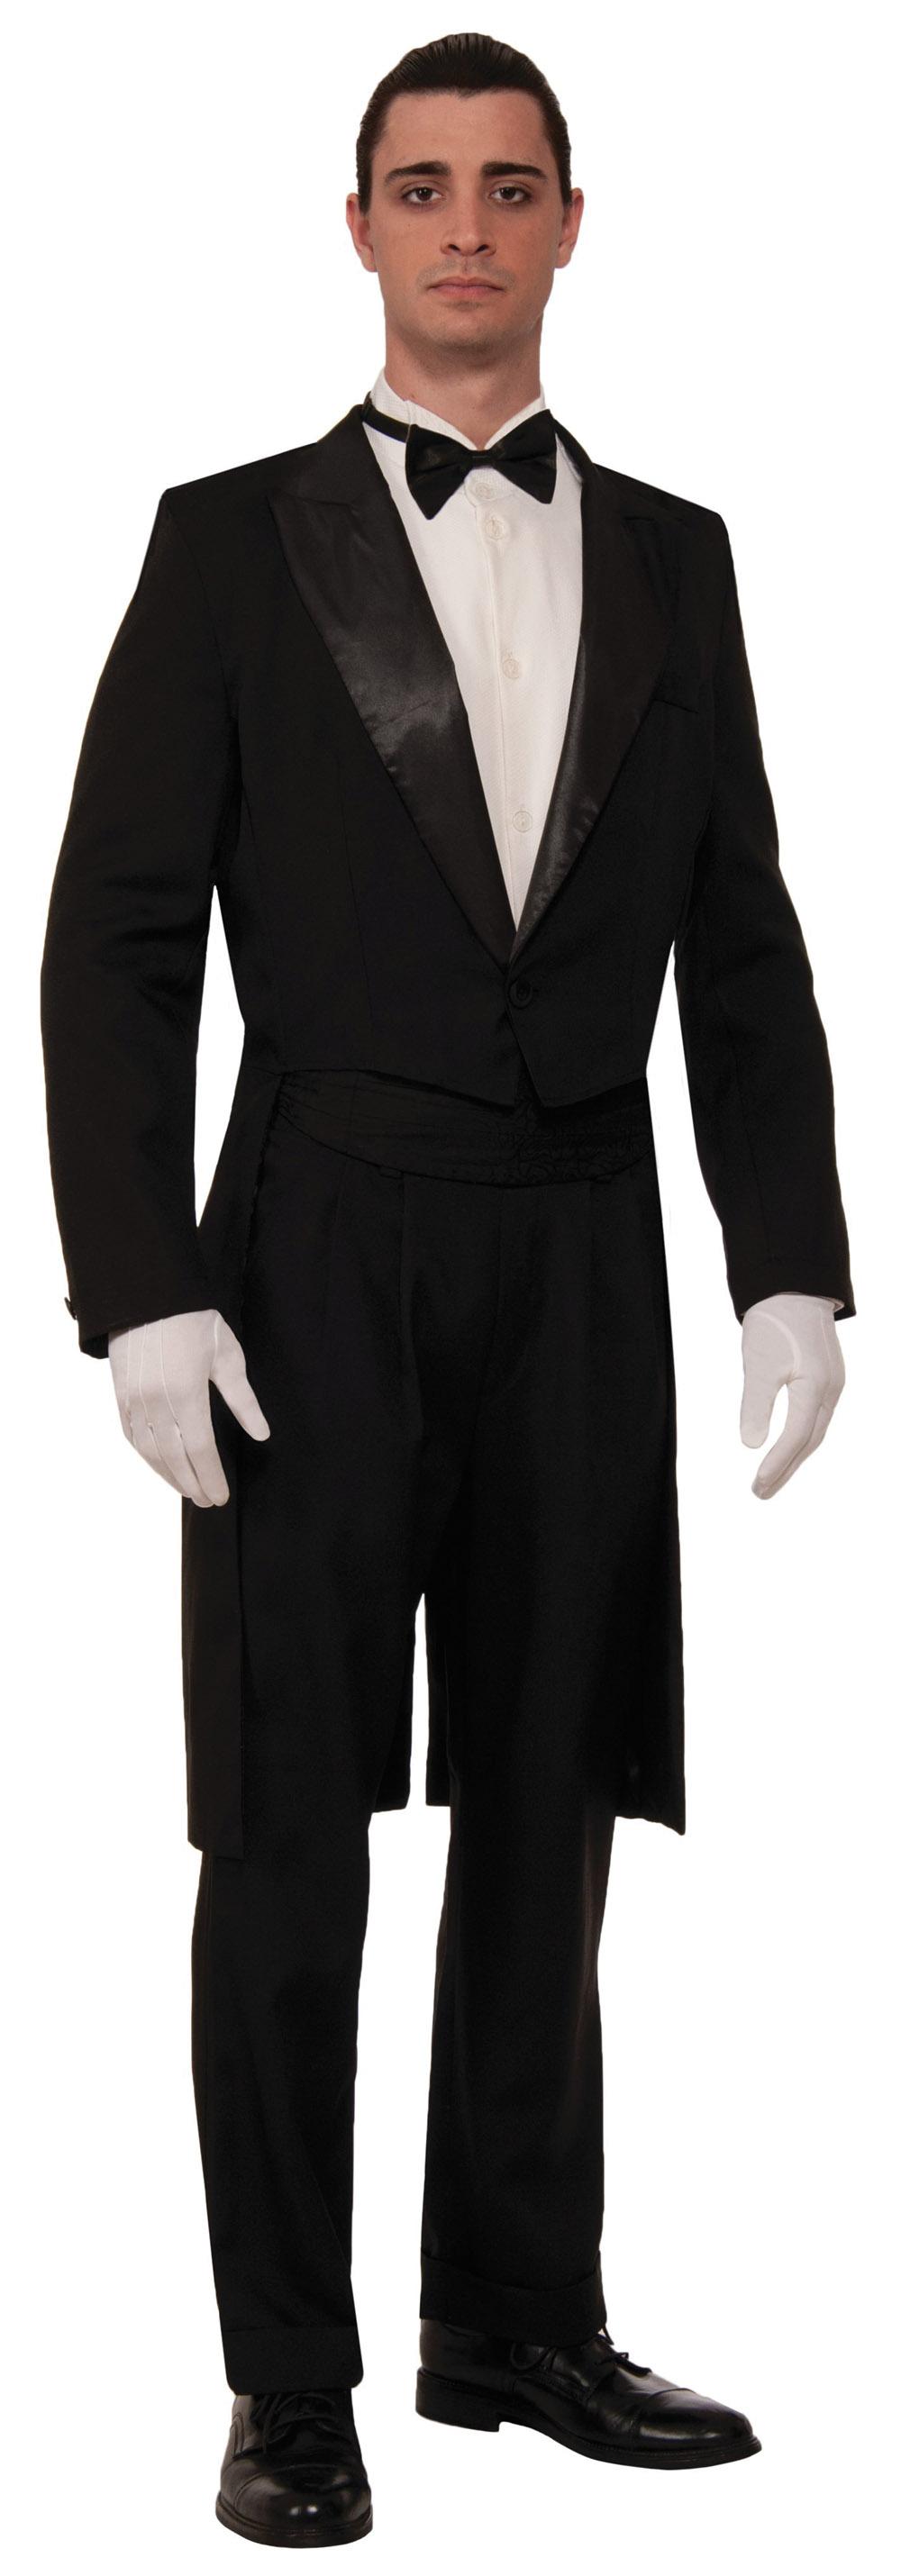 Adult Tuxedo Costume